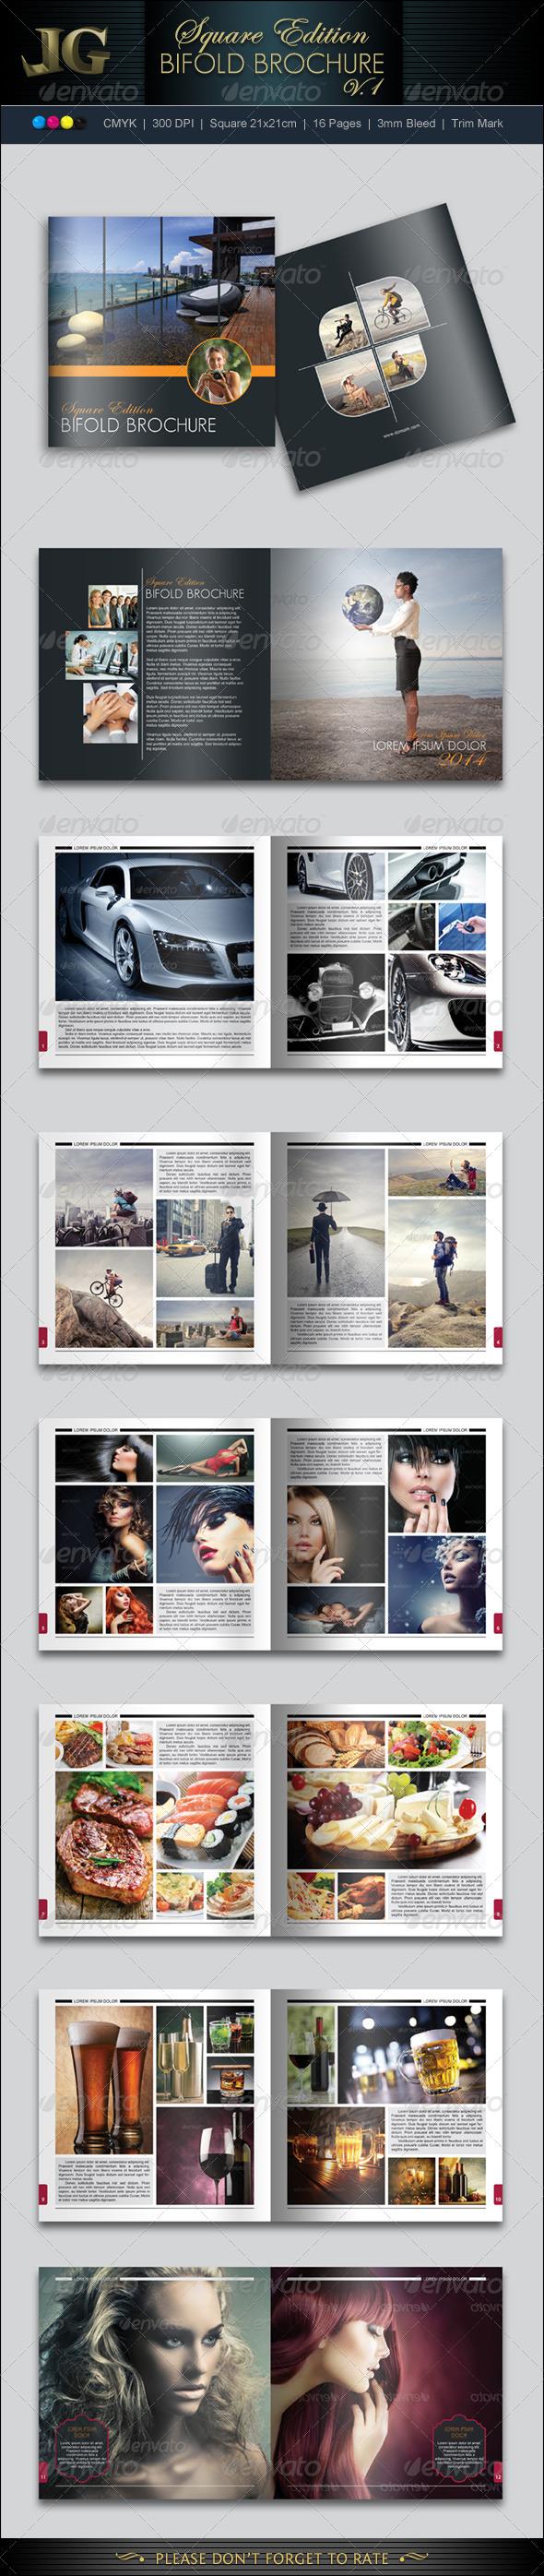 Bifold Brochure V1 - Photo Albums Print Templates